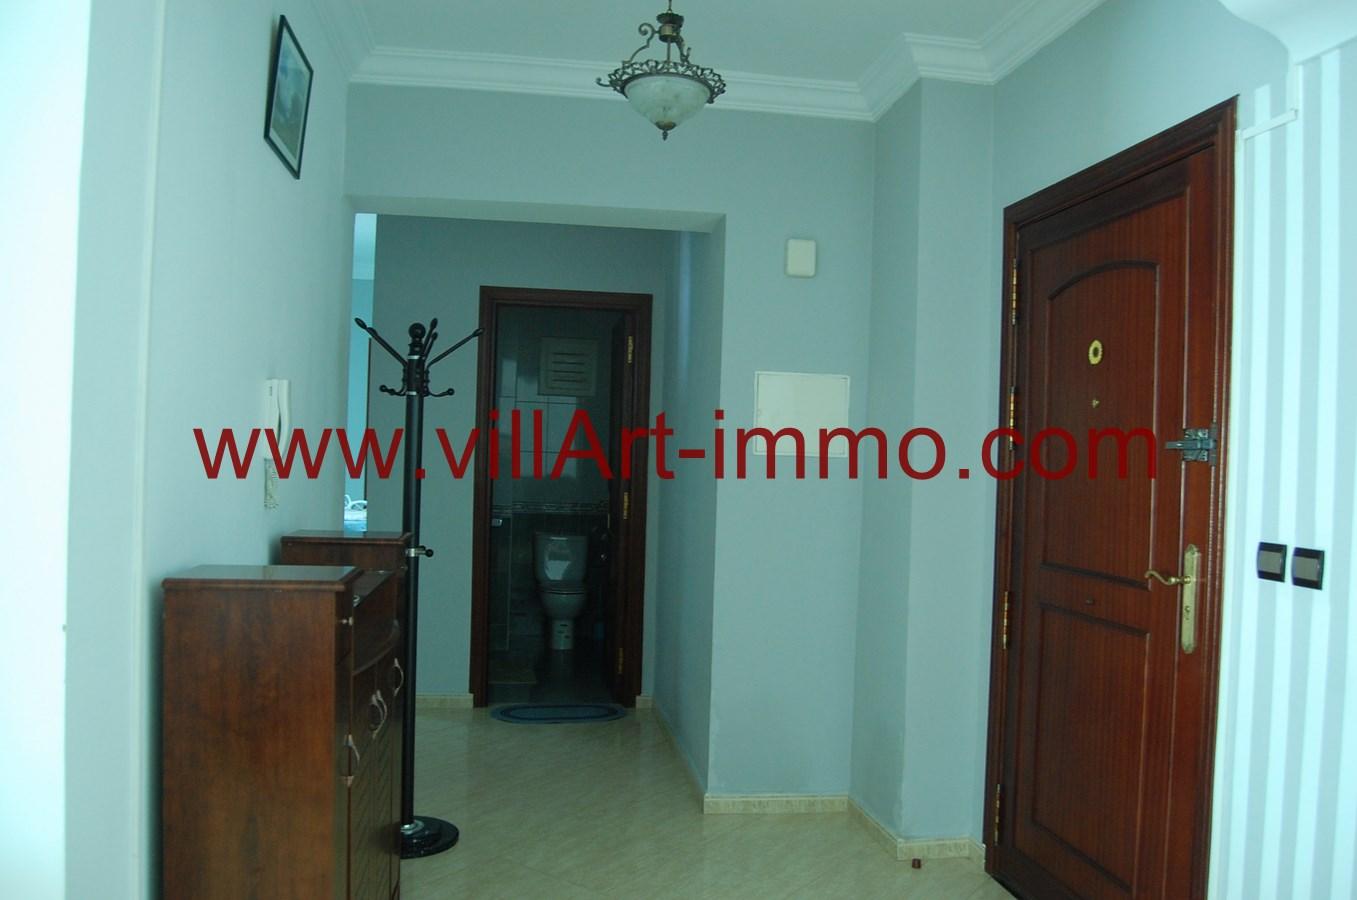 4-A louer-Appartement-Meublé-Tanger-Entrée-L900-Villart immo